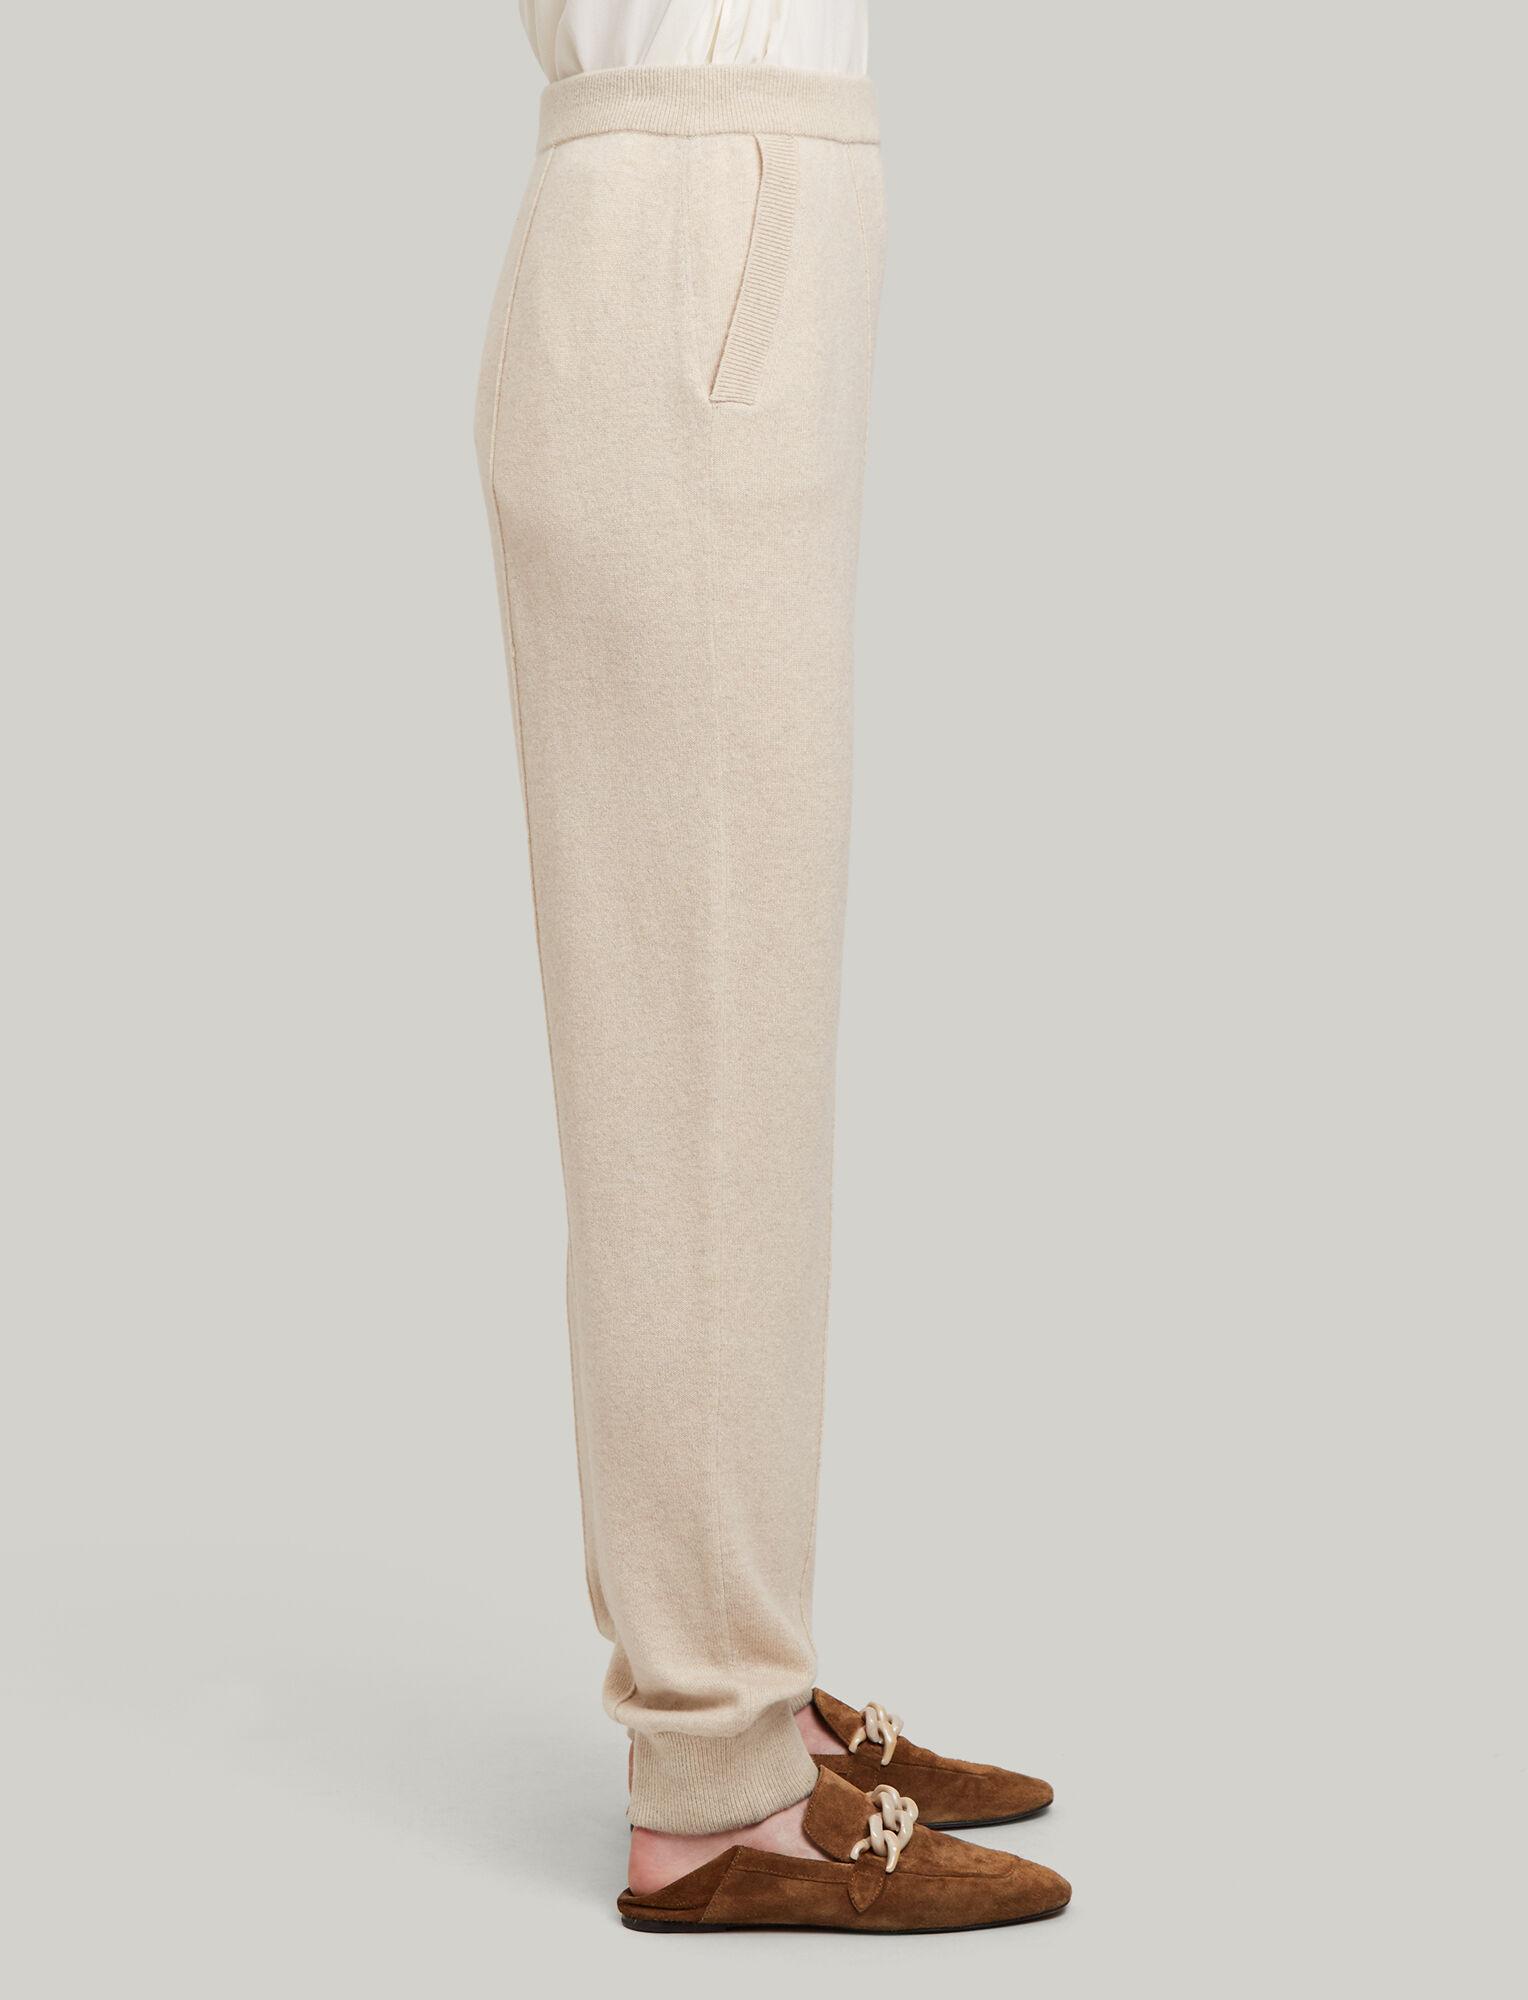 Joseph, Oversize Jog Mongolian Cashmere Trousers, in BEIGE CHINE